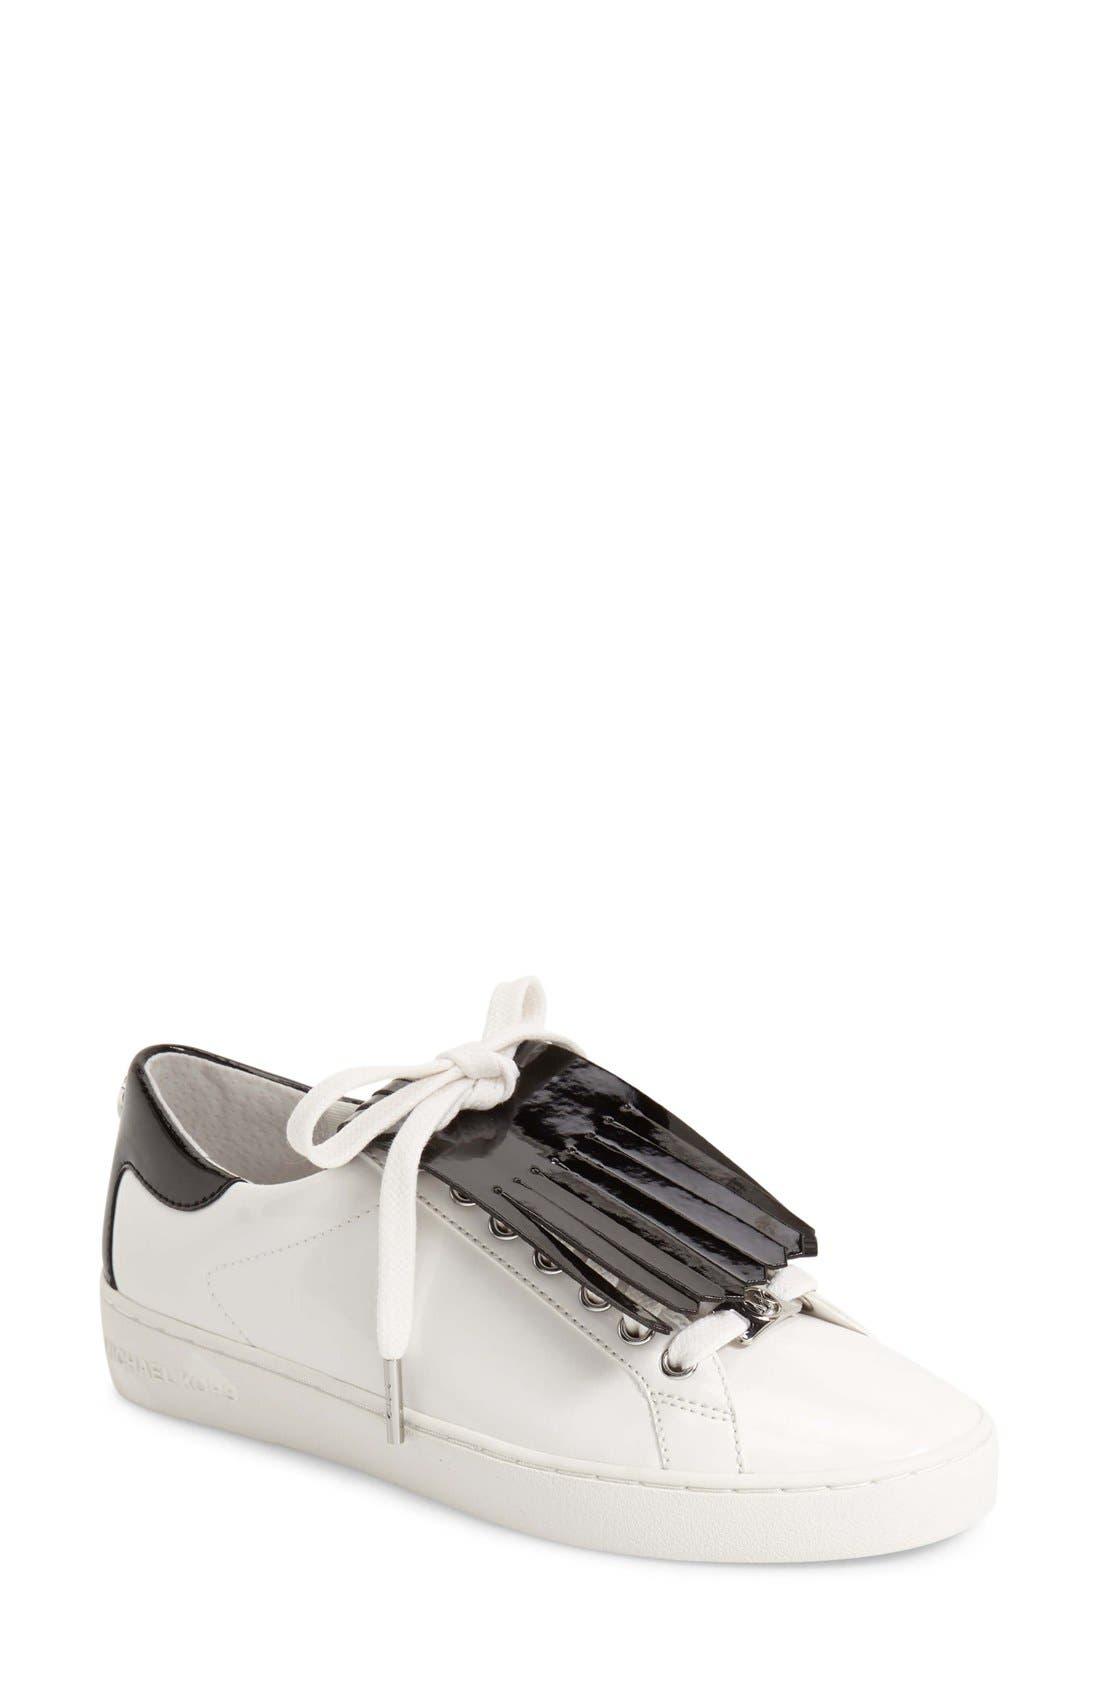 Alternate Image 1 Selected - MICHAEL Michael Kors'Keaton' KiltieSneaker (Women)